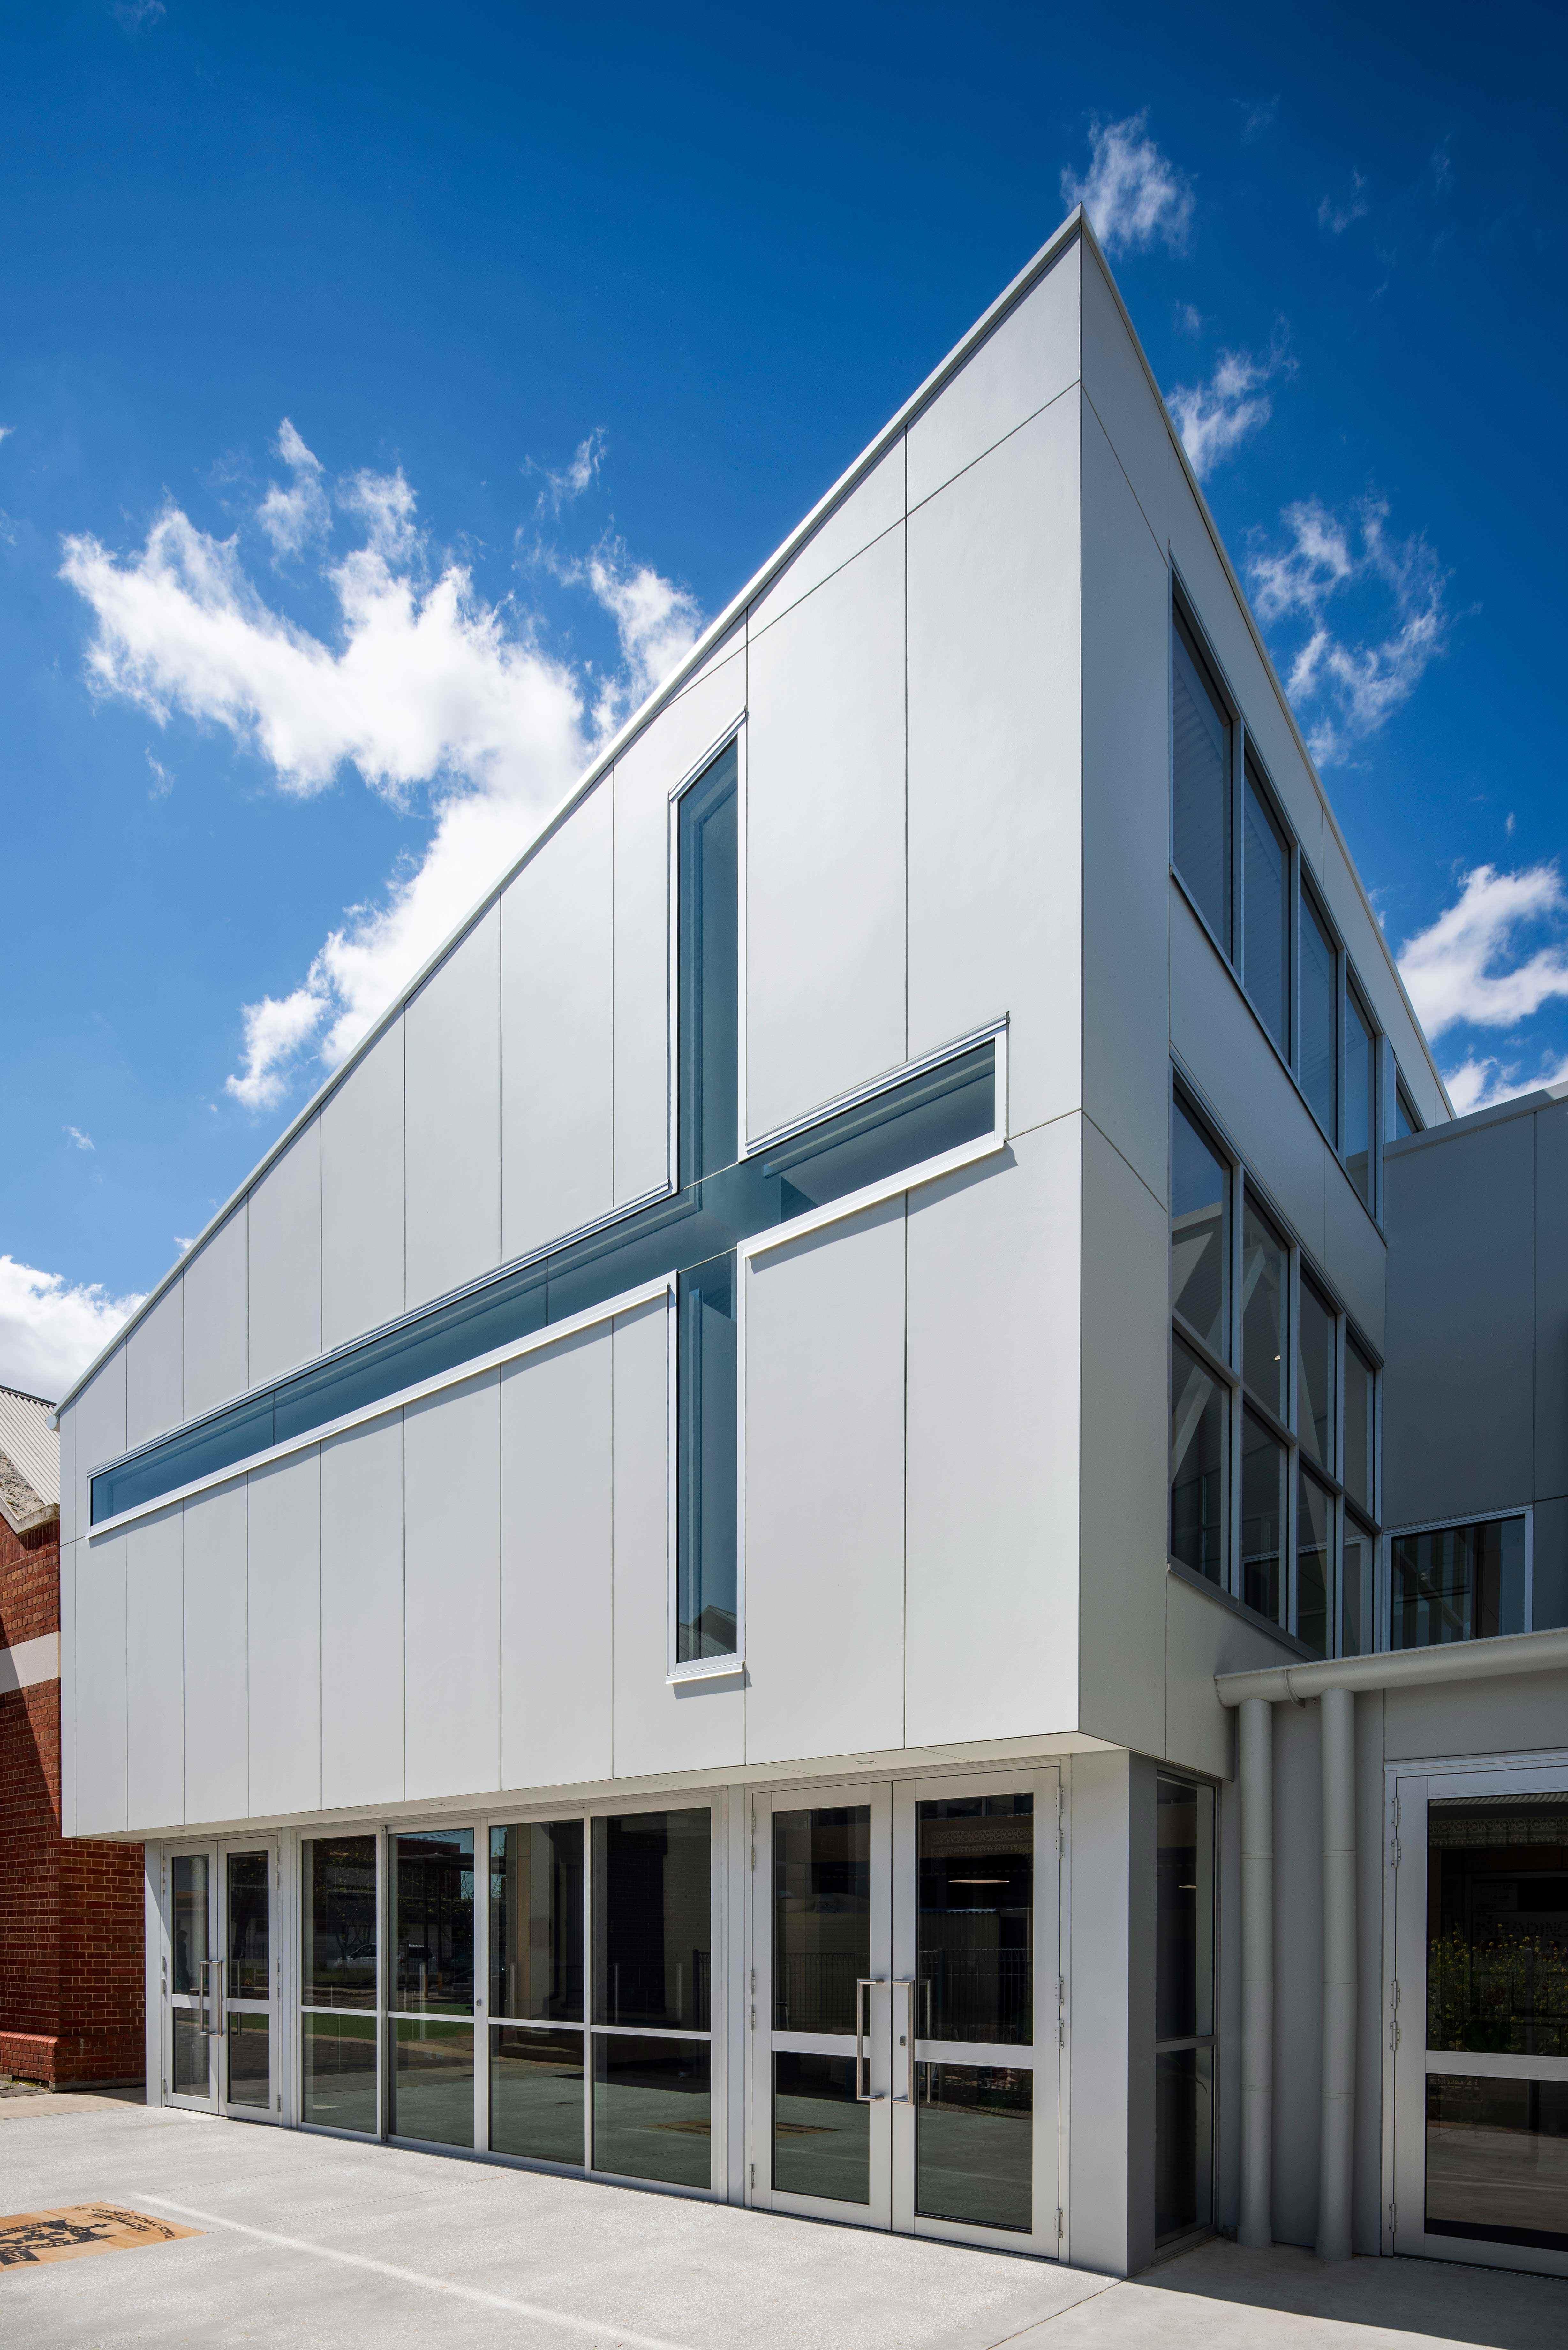 St. Joseph's School Hindmarsh